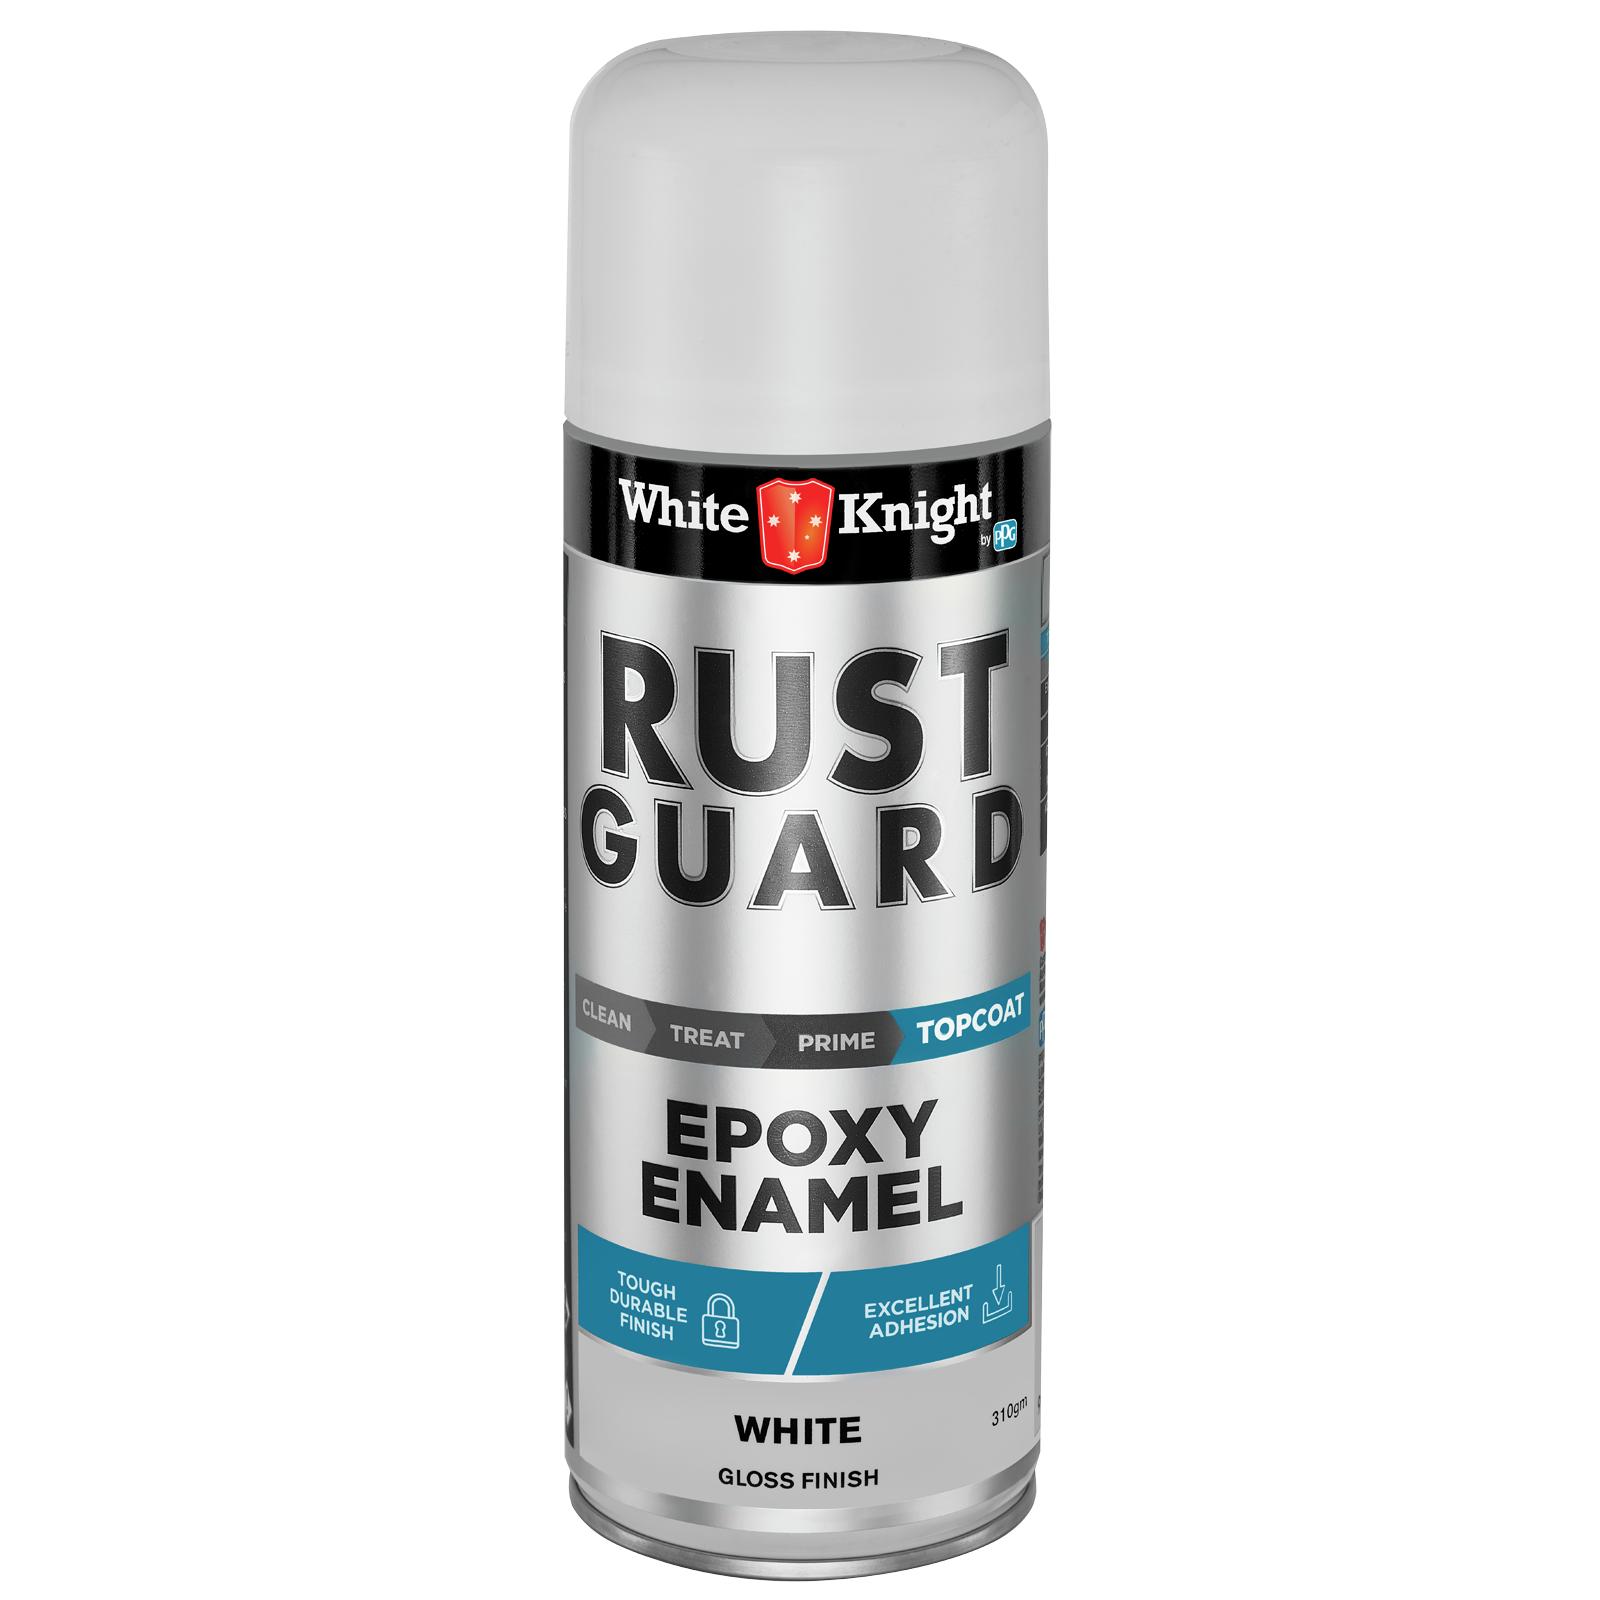 White Knight Rust Guard 310g Gloss White Epoxy Enamel Spray Paint